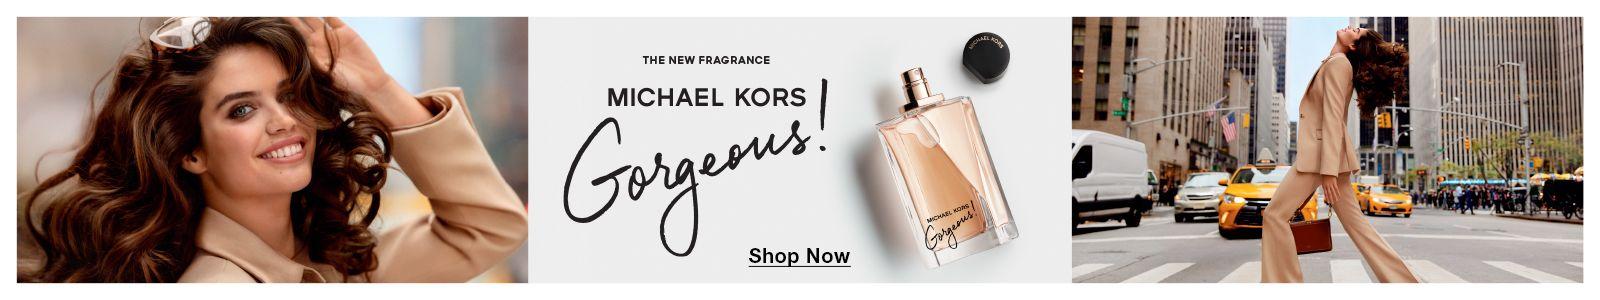 The New Fragrance, Michael Kors Gorgeous! Shop Now